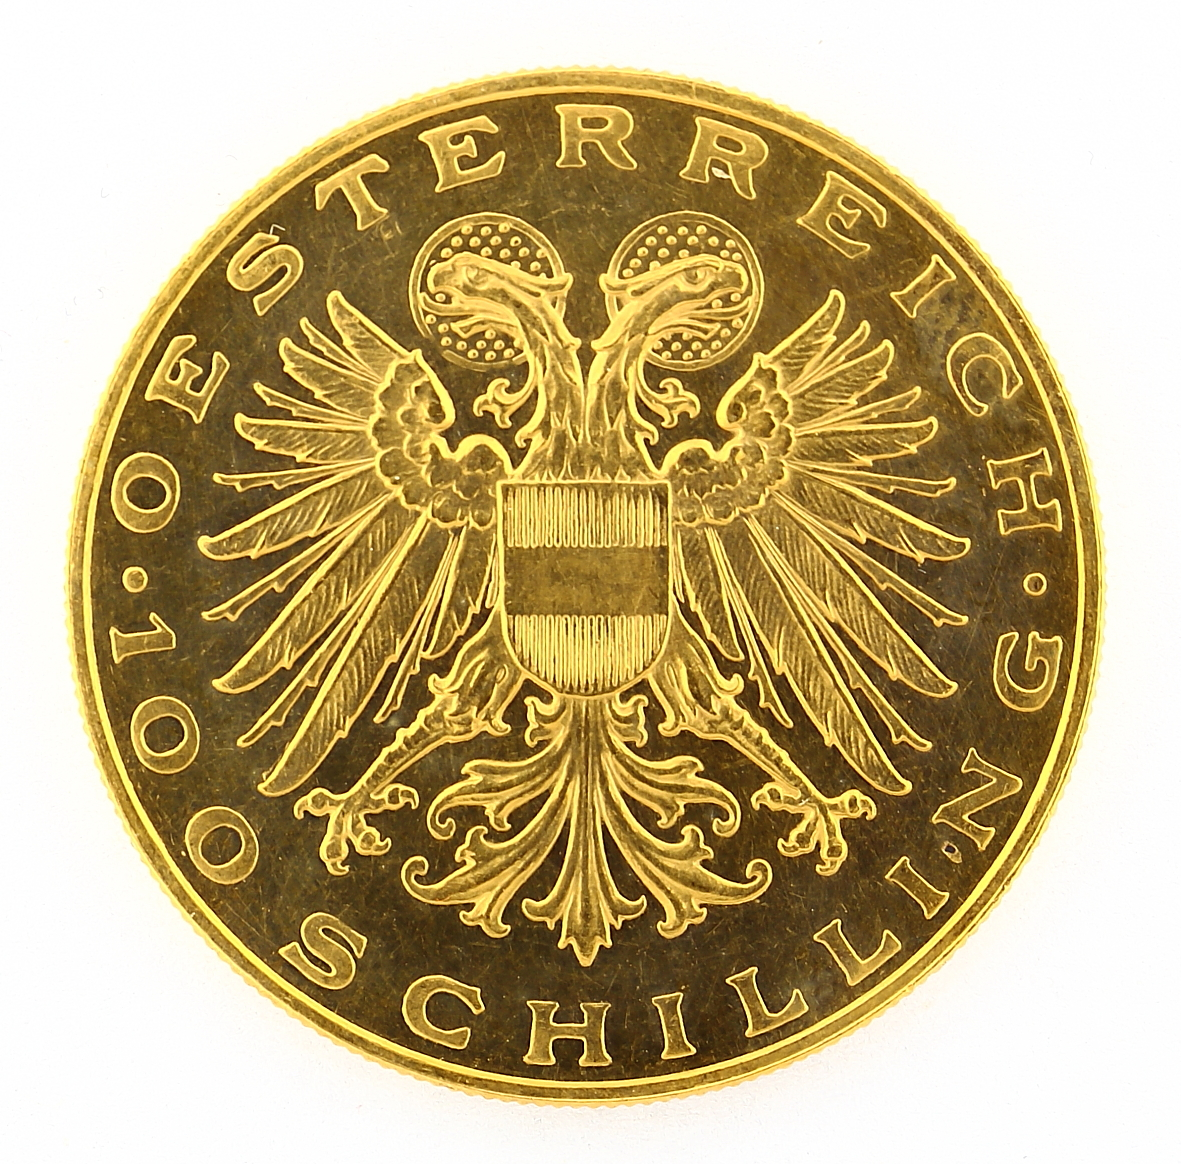 Fileösterreich 100 Schilling Münze 1936 Aversjpg Wikimedia